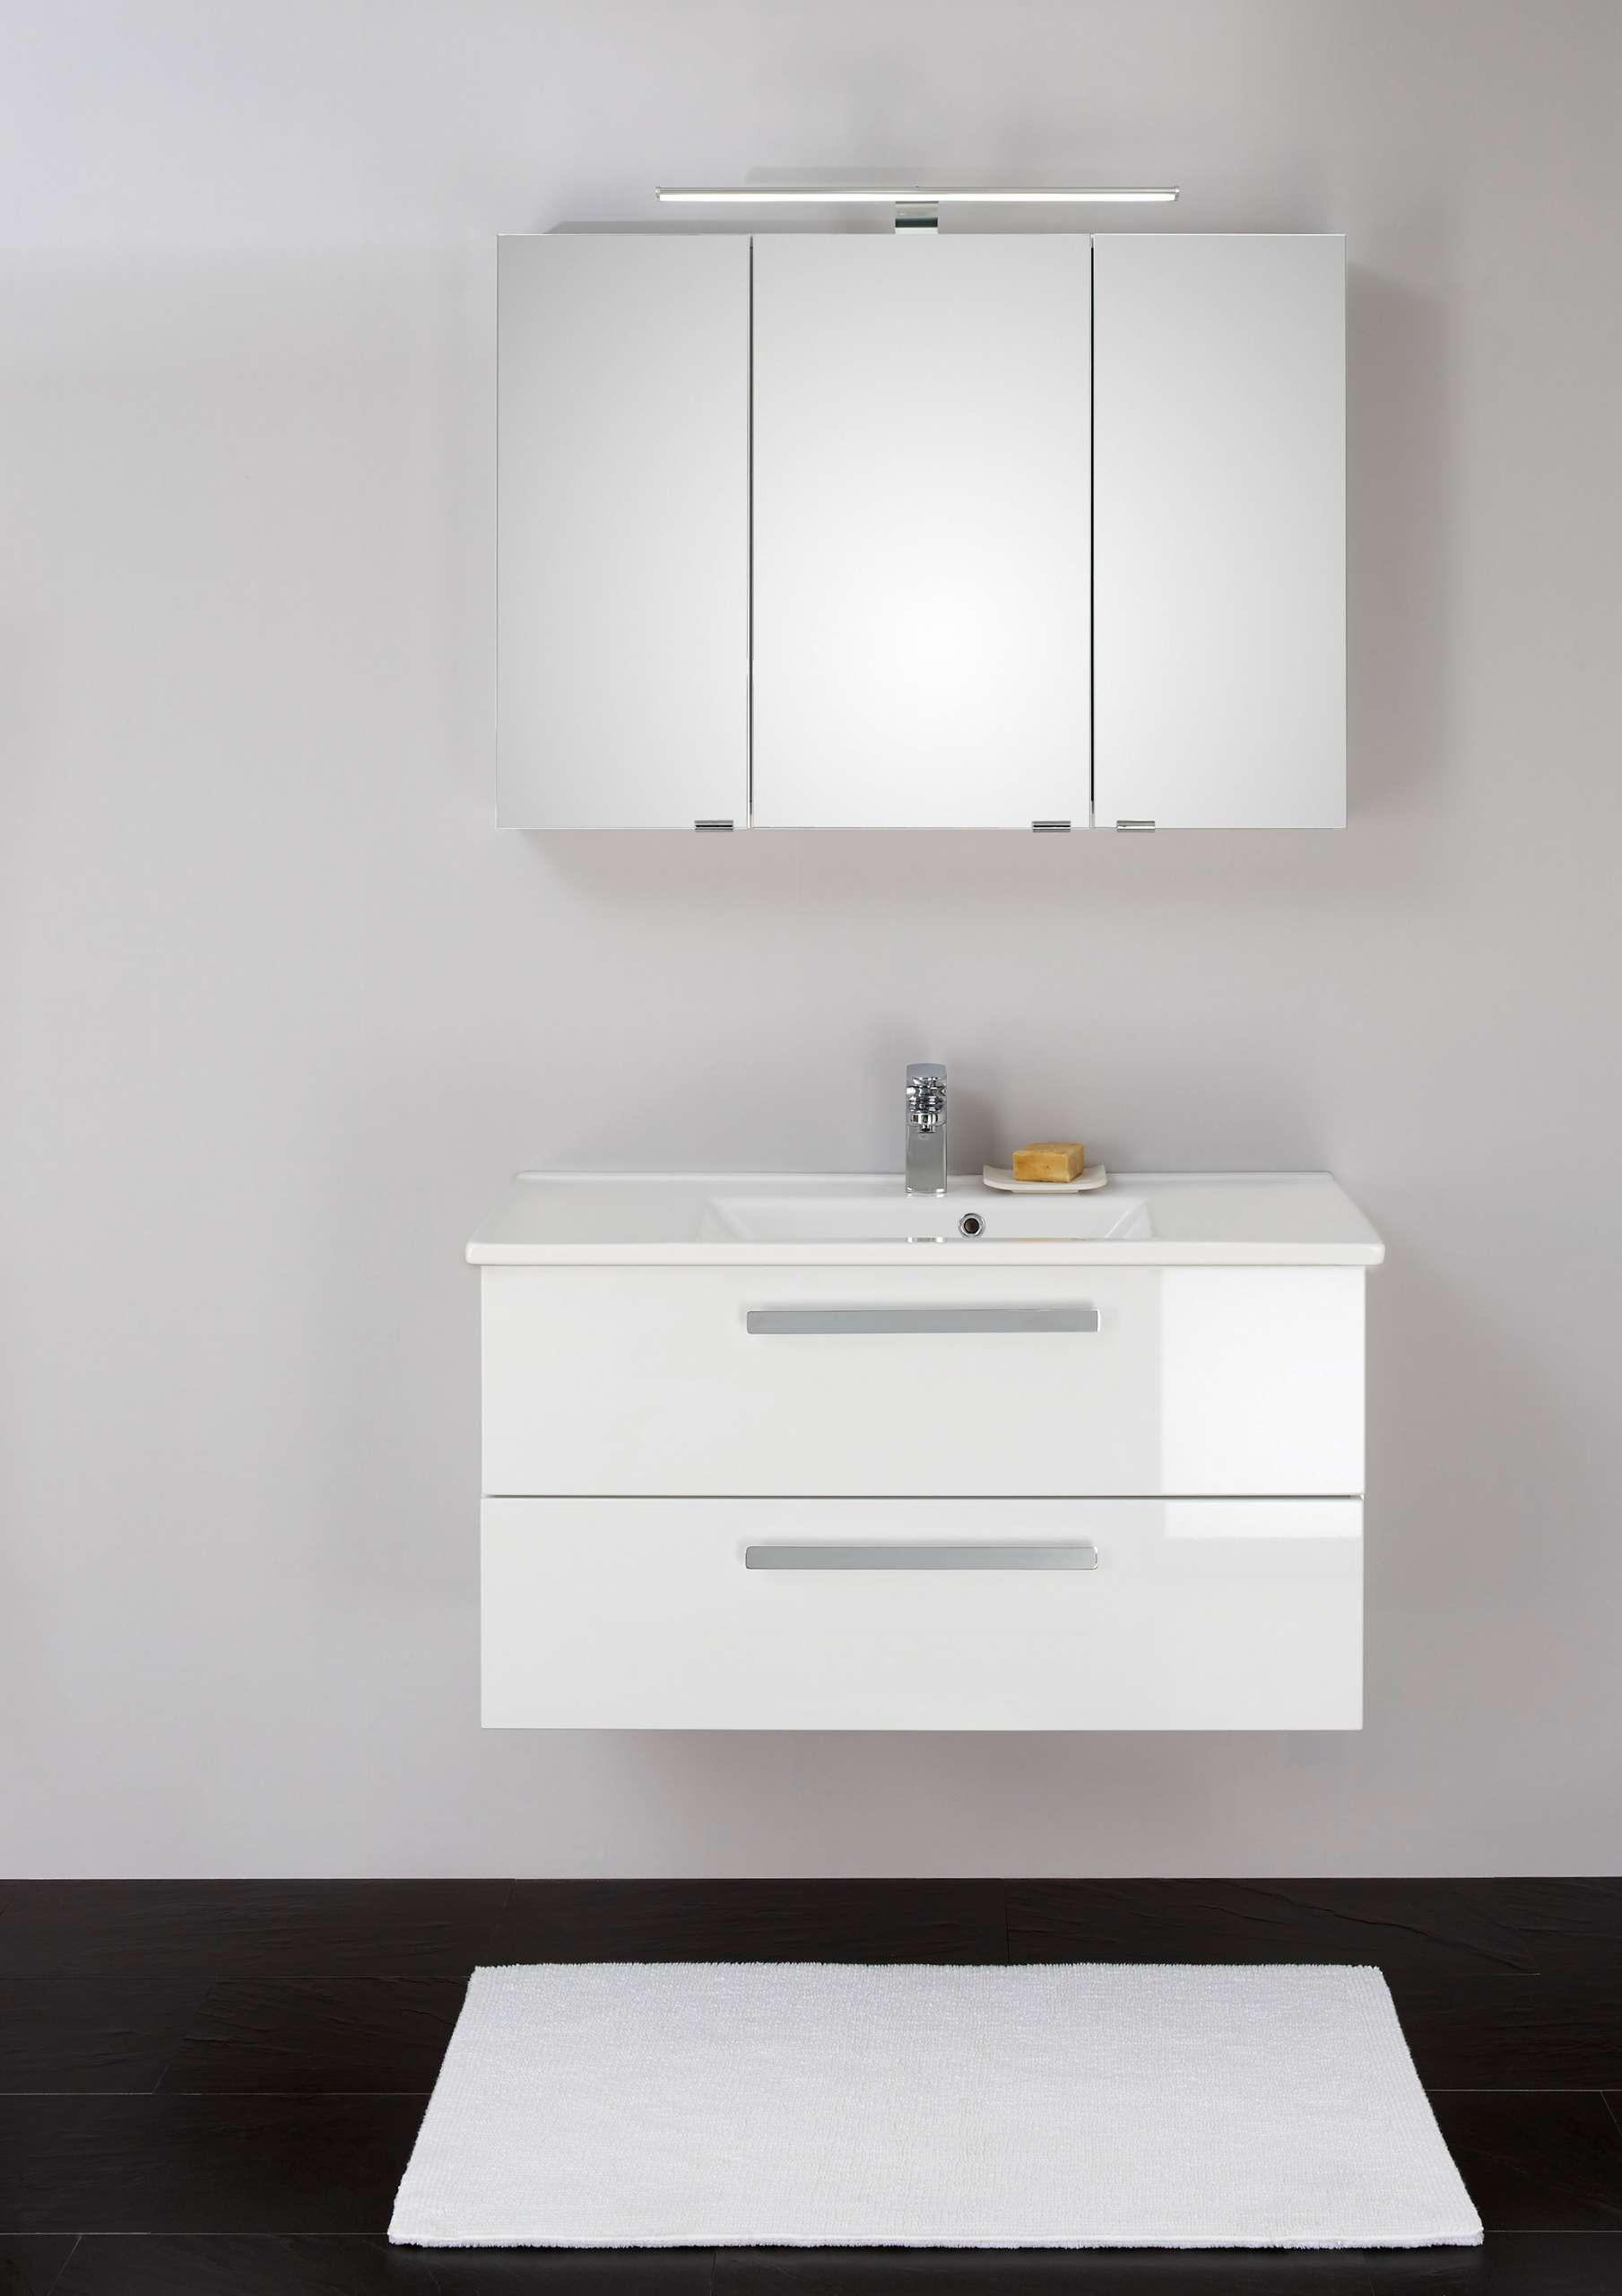 Artiqua Waschtischset 1000mm | Badmöbel | Badezimmer | KBE ...